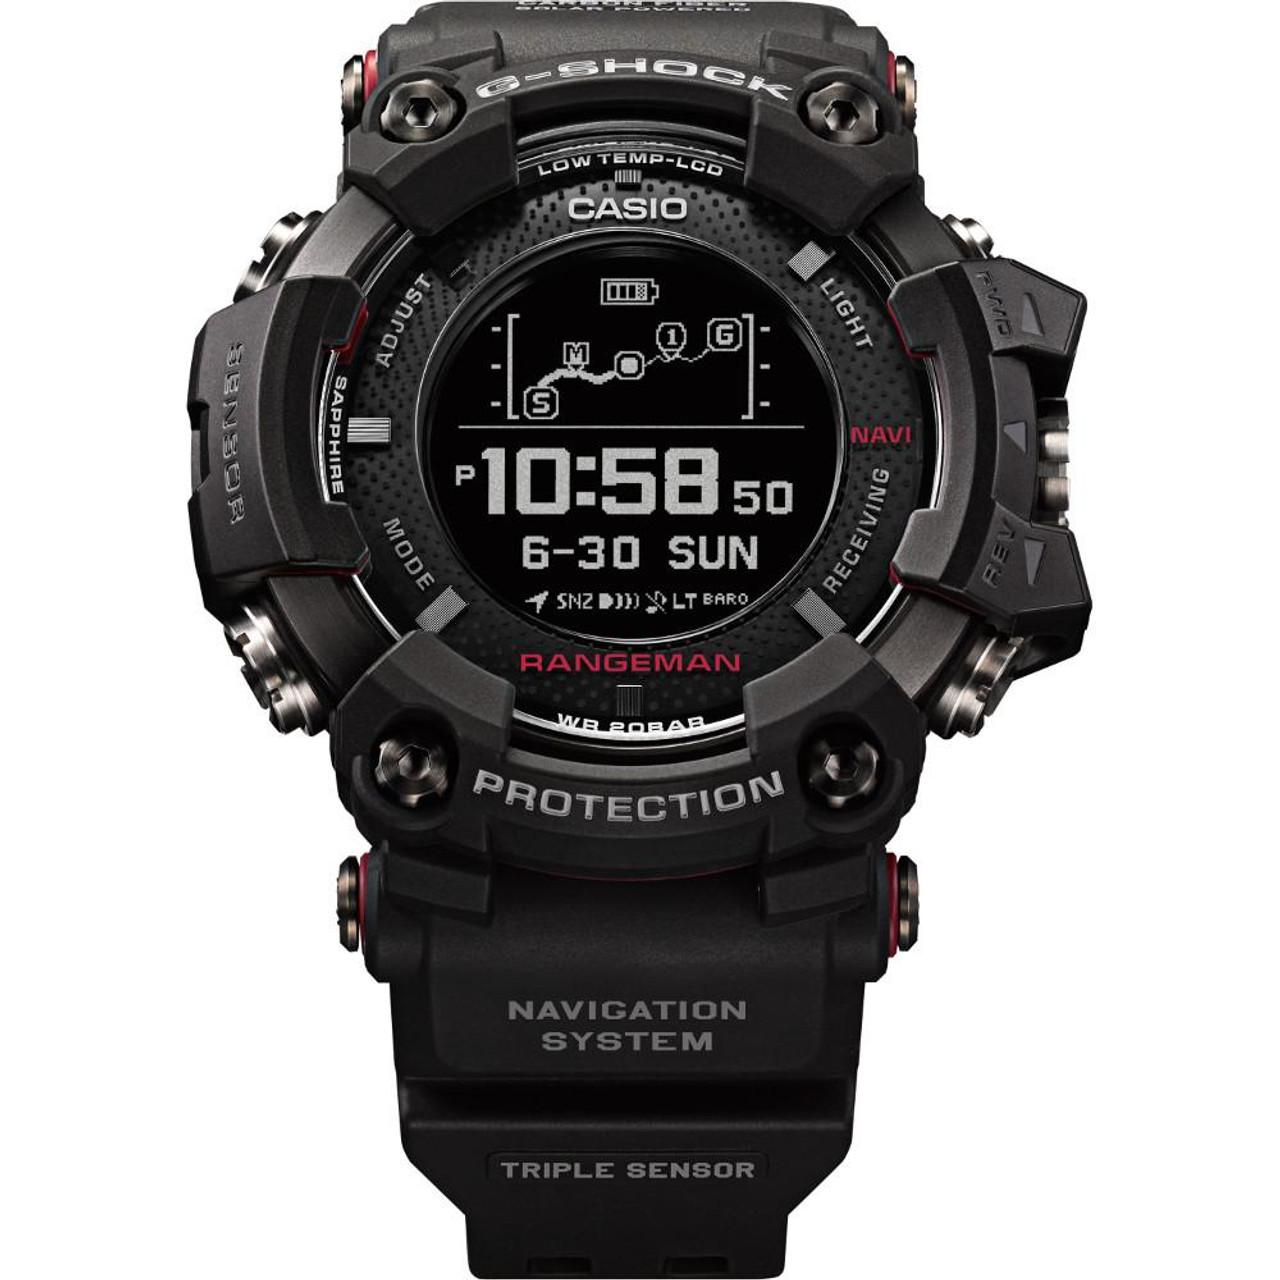 e5483e4265 G-Shock Rangeman GPS Navigation Bluetooth Triple Sensor Solar Watch  GPR-B1000-1ER